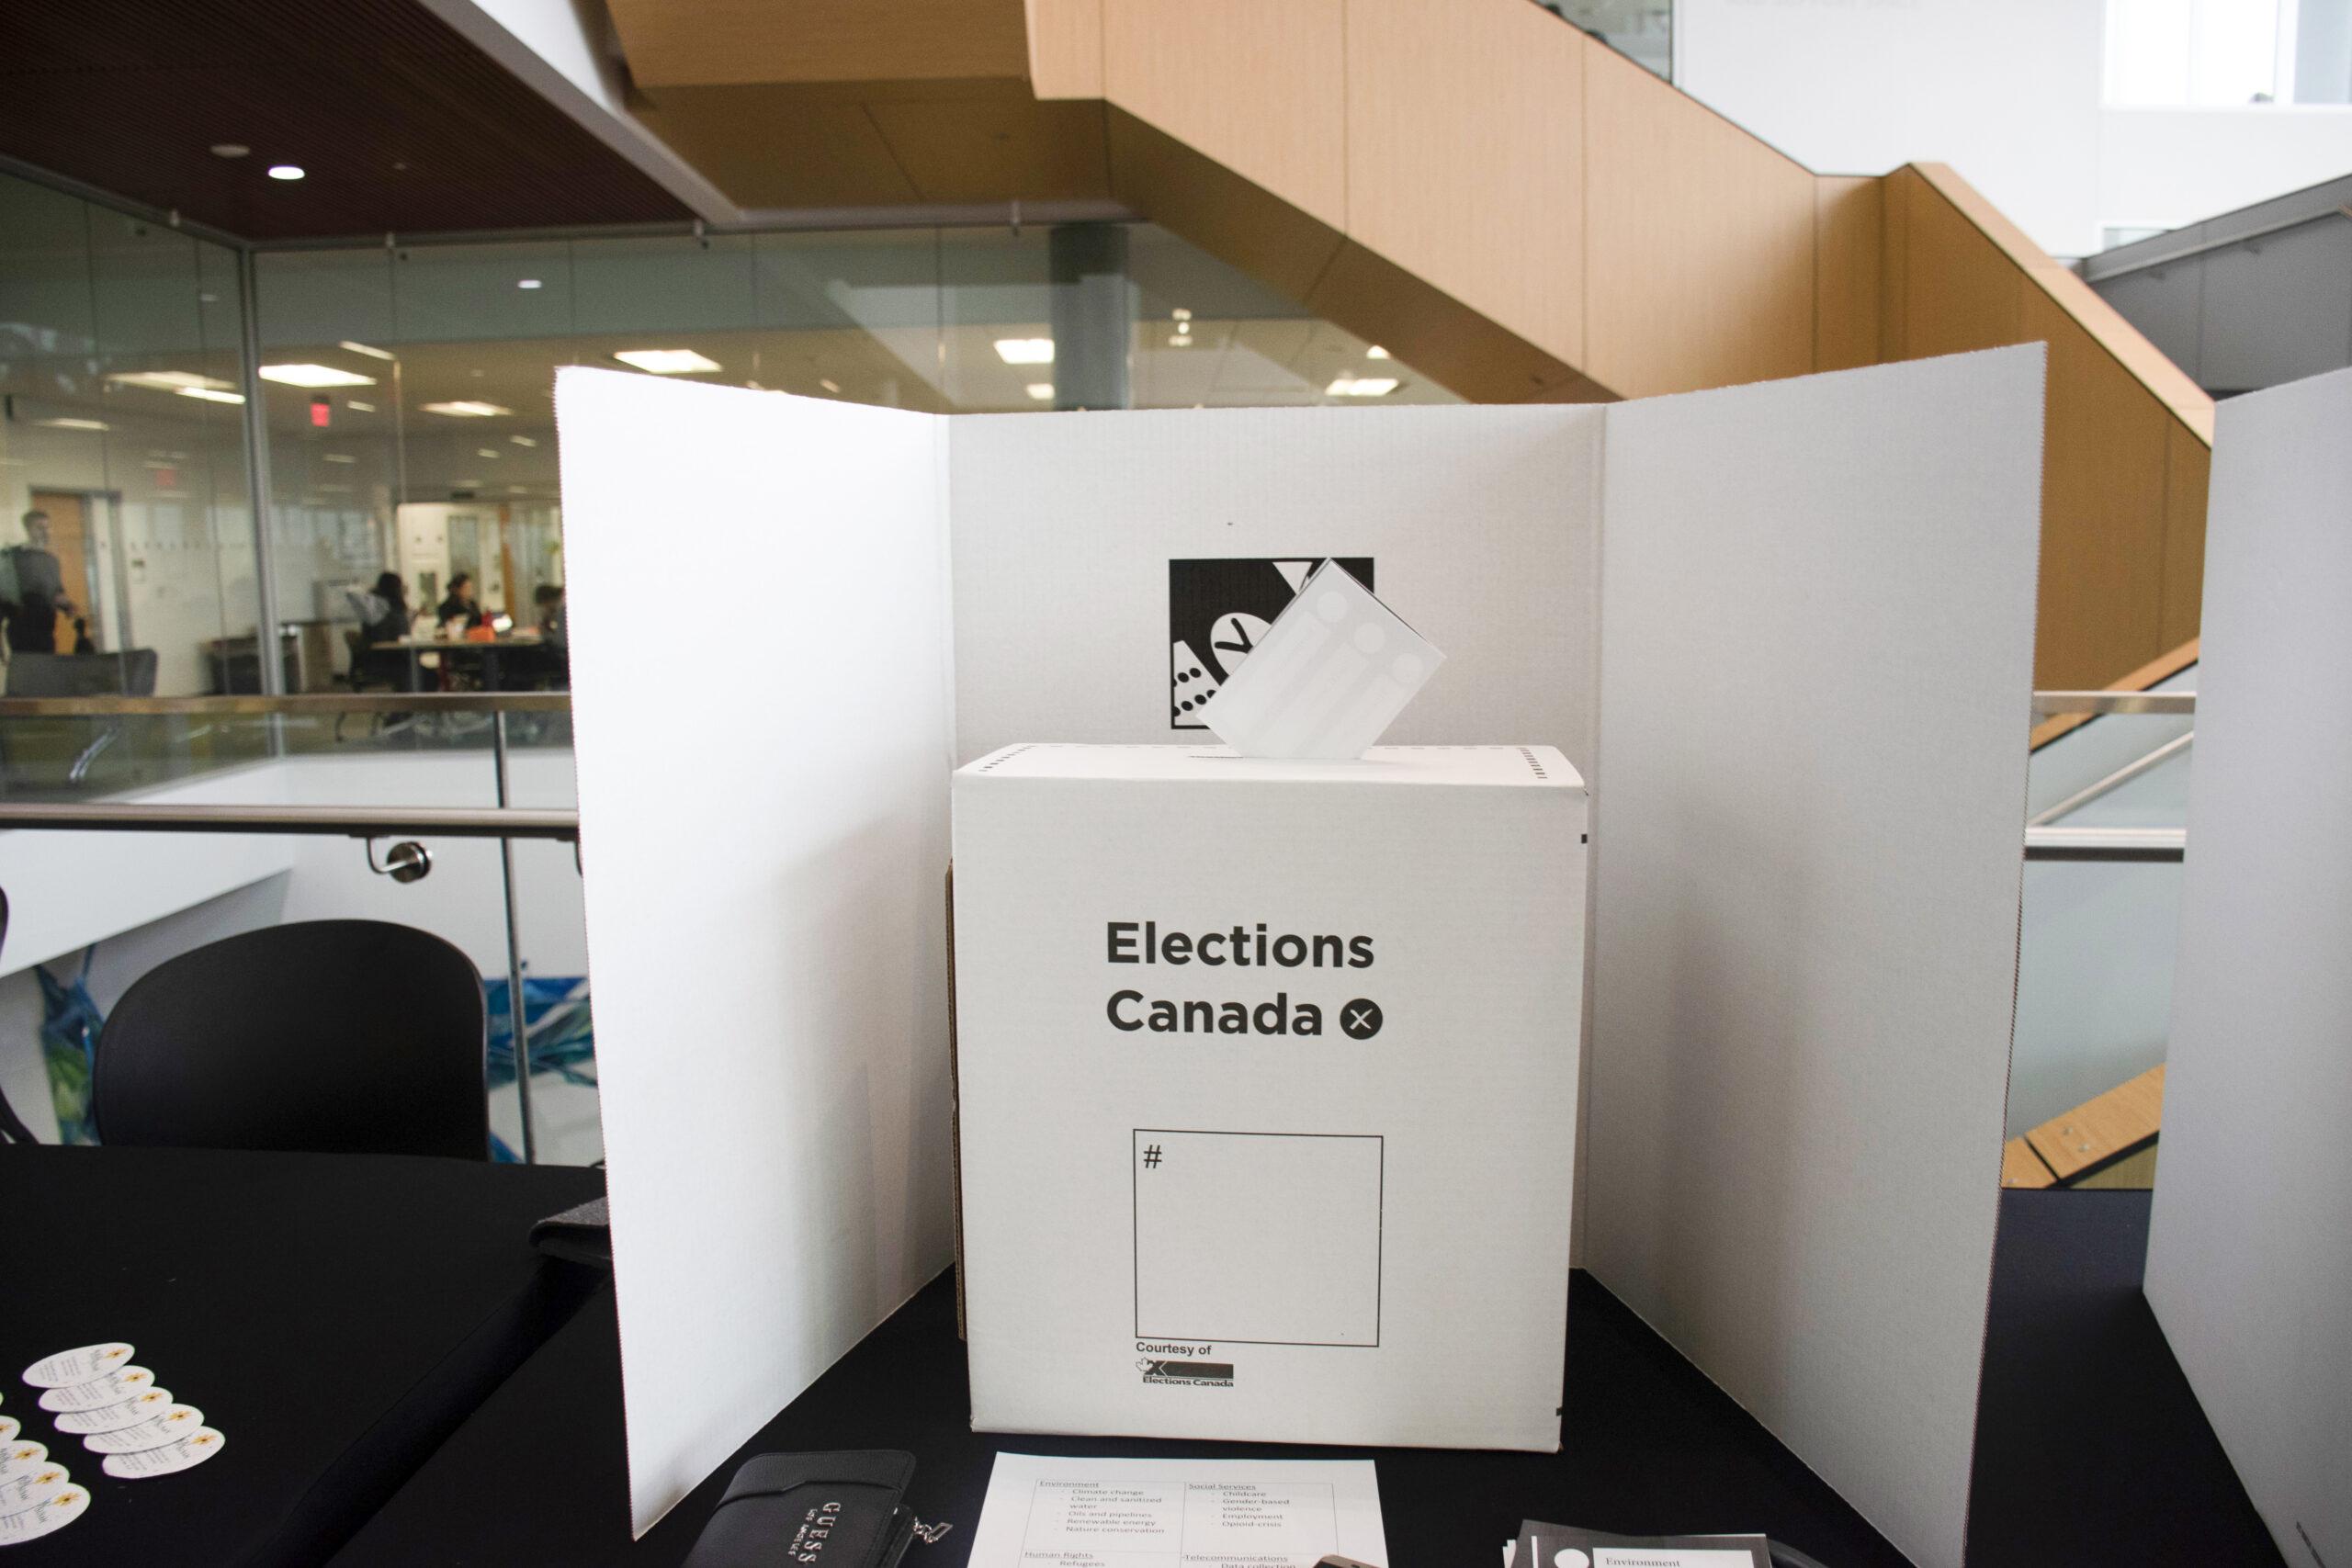 Students among 4.8 million advance voters